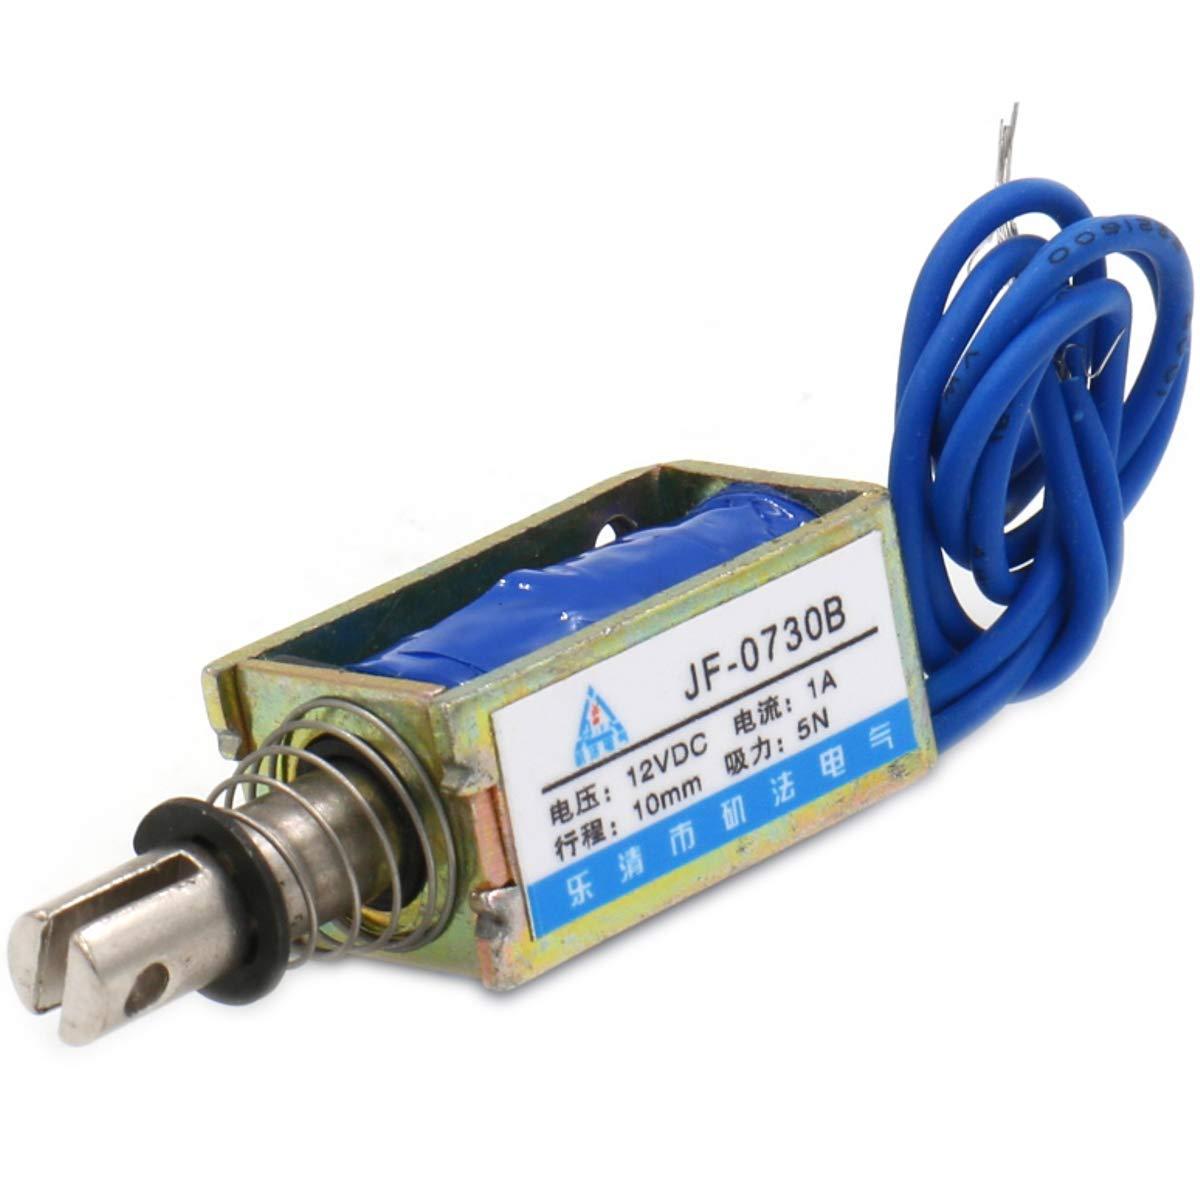 Hechen Elettromagnete Solenoide jf-0730b DC 12/V 1/A 5/N 10/millimetri corsa Push Pull tipo struttura aperta